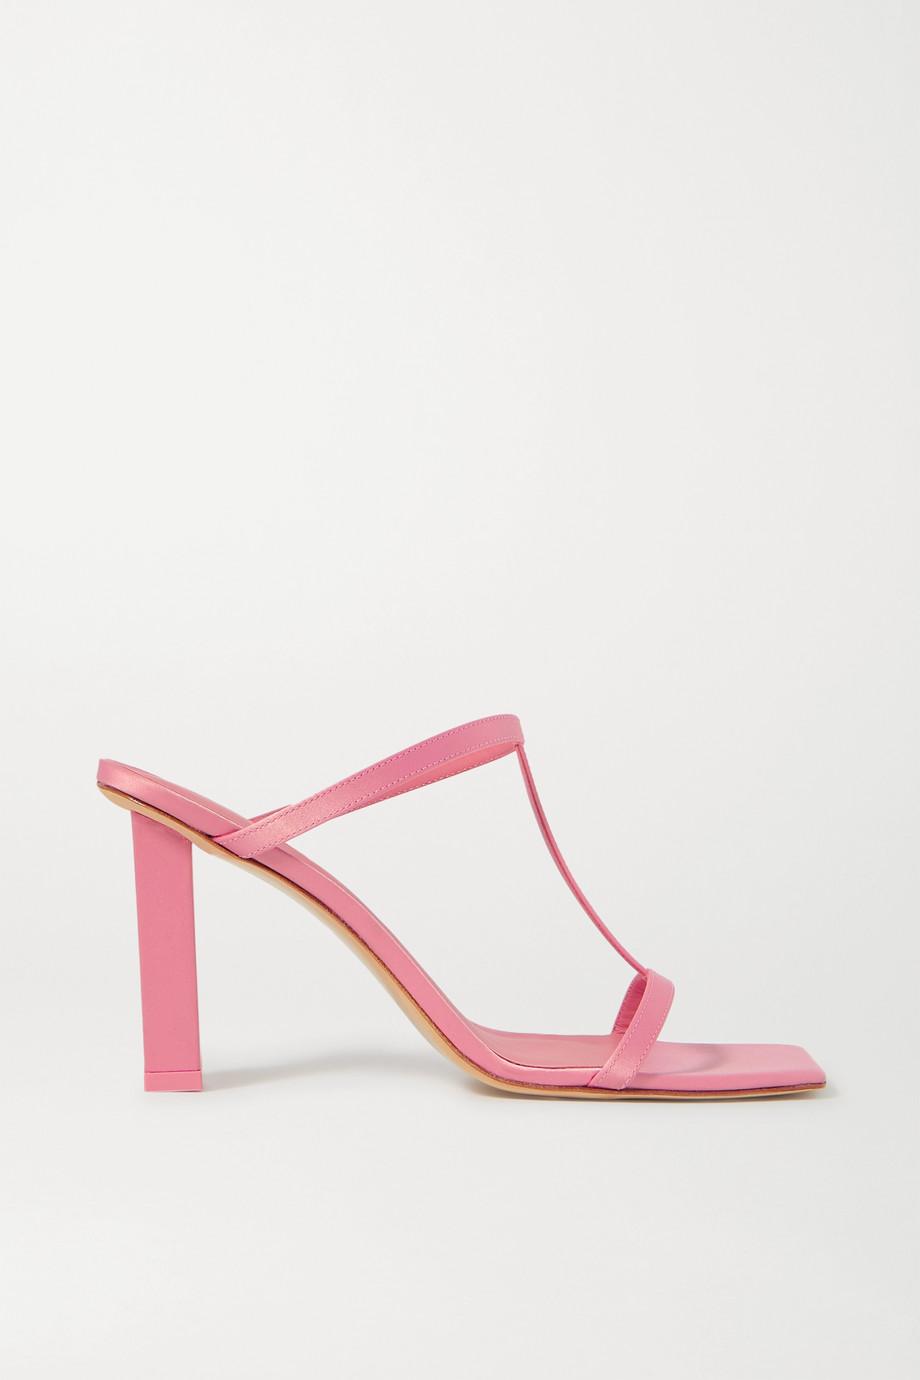 Cult Gaia Piper 罗缎穆勒鞋